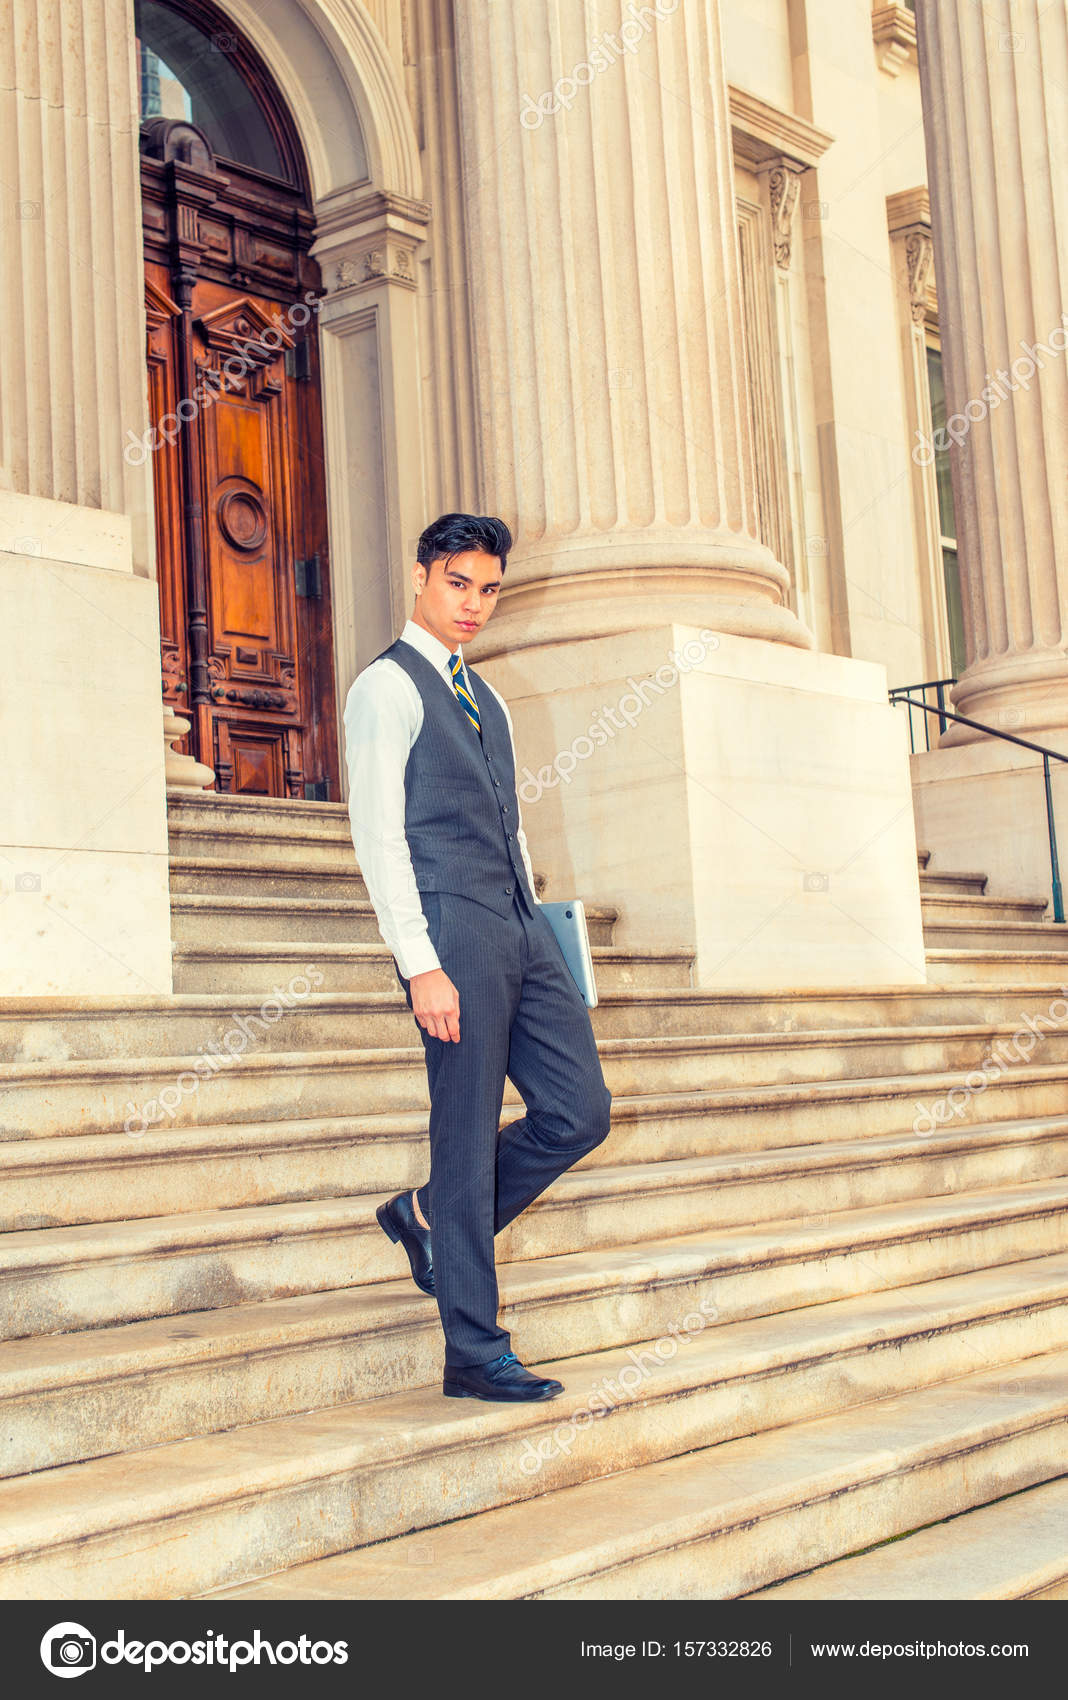 60726cb5e9e9 Νεαρά ασιατικές αμερικανικές άνθρωπος των επιχειρήσεων — Φωτογραφία ...